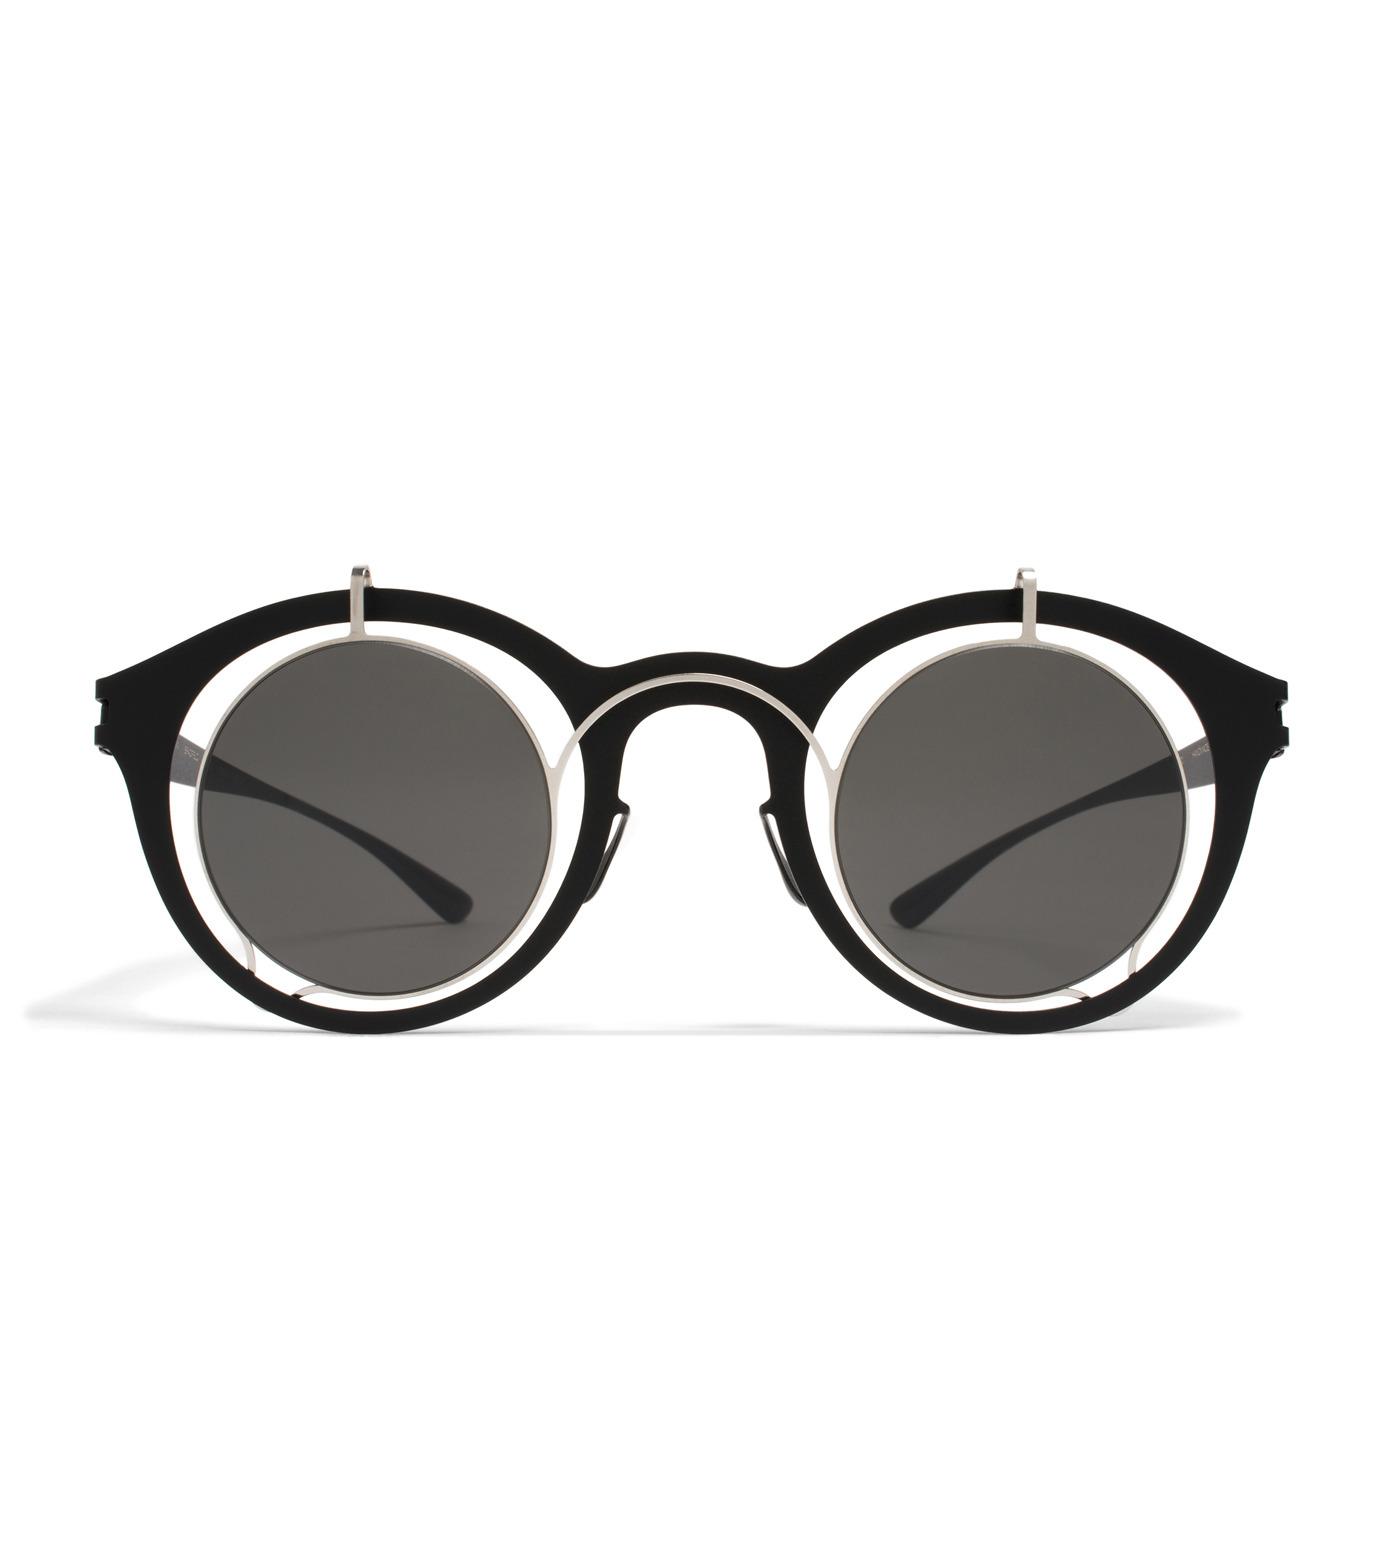 MYKITA(マイキータ)のBRADFIELD SUN-BLACK(アイウェア/eyewear)-BRADFIELDSUN-13 拡大詳細画像2